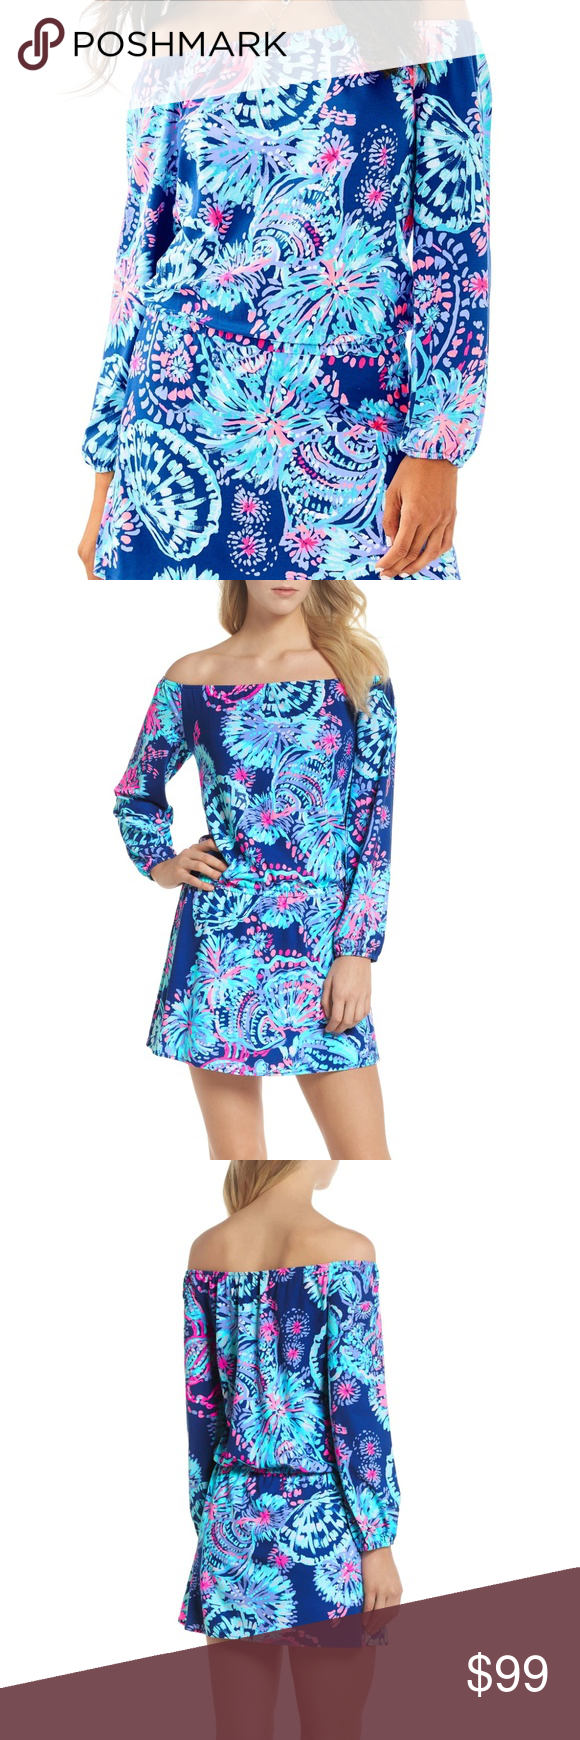 0edb14e83ec Lilly Pulitzer Lana Skort Romper Color  Deep Indigo Gypsea Girl Size  XS  This vibrant